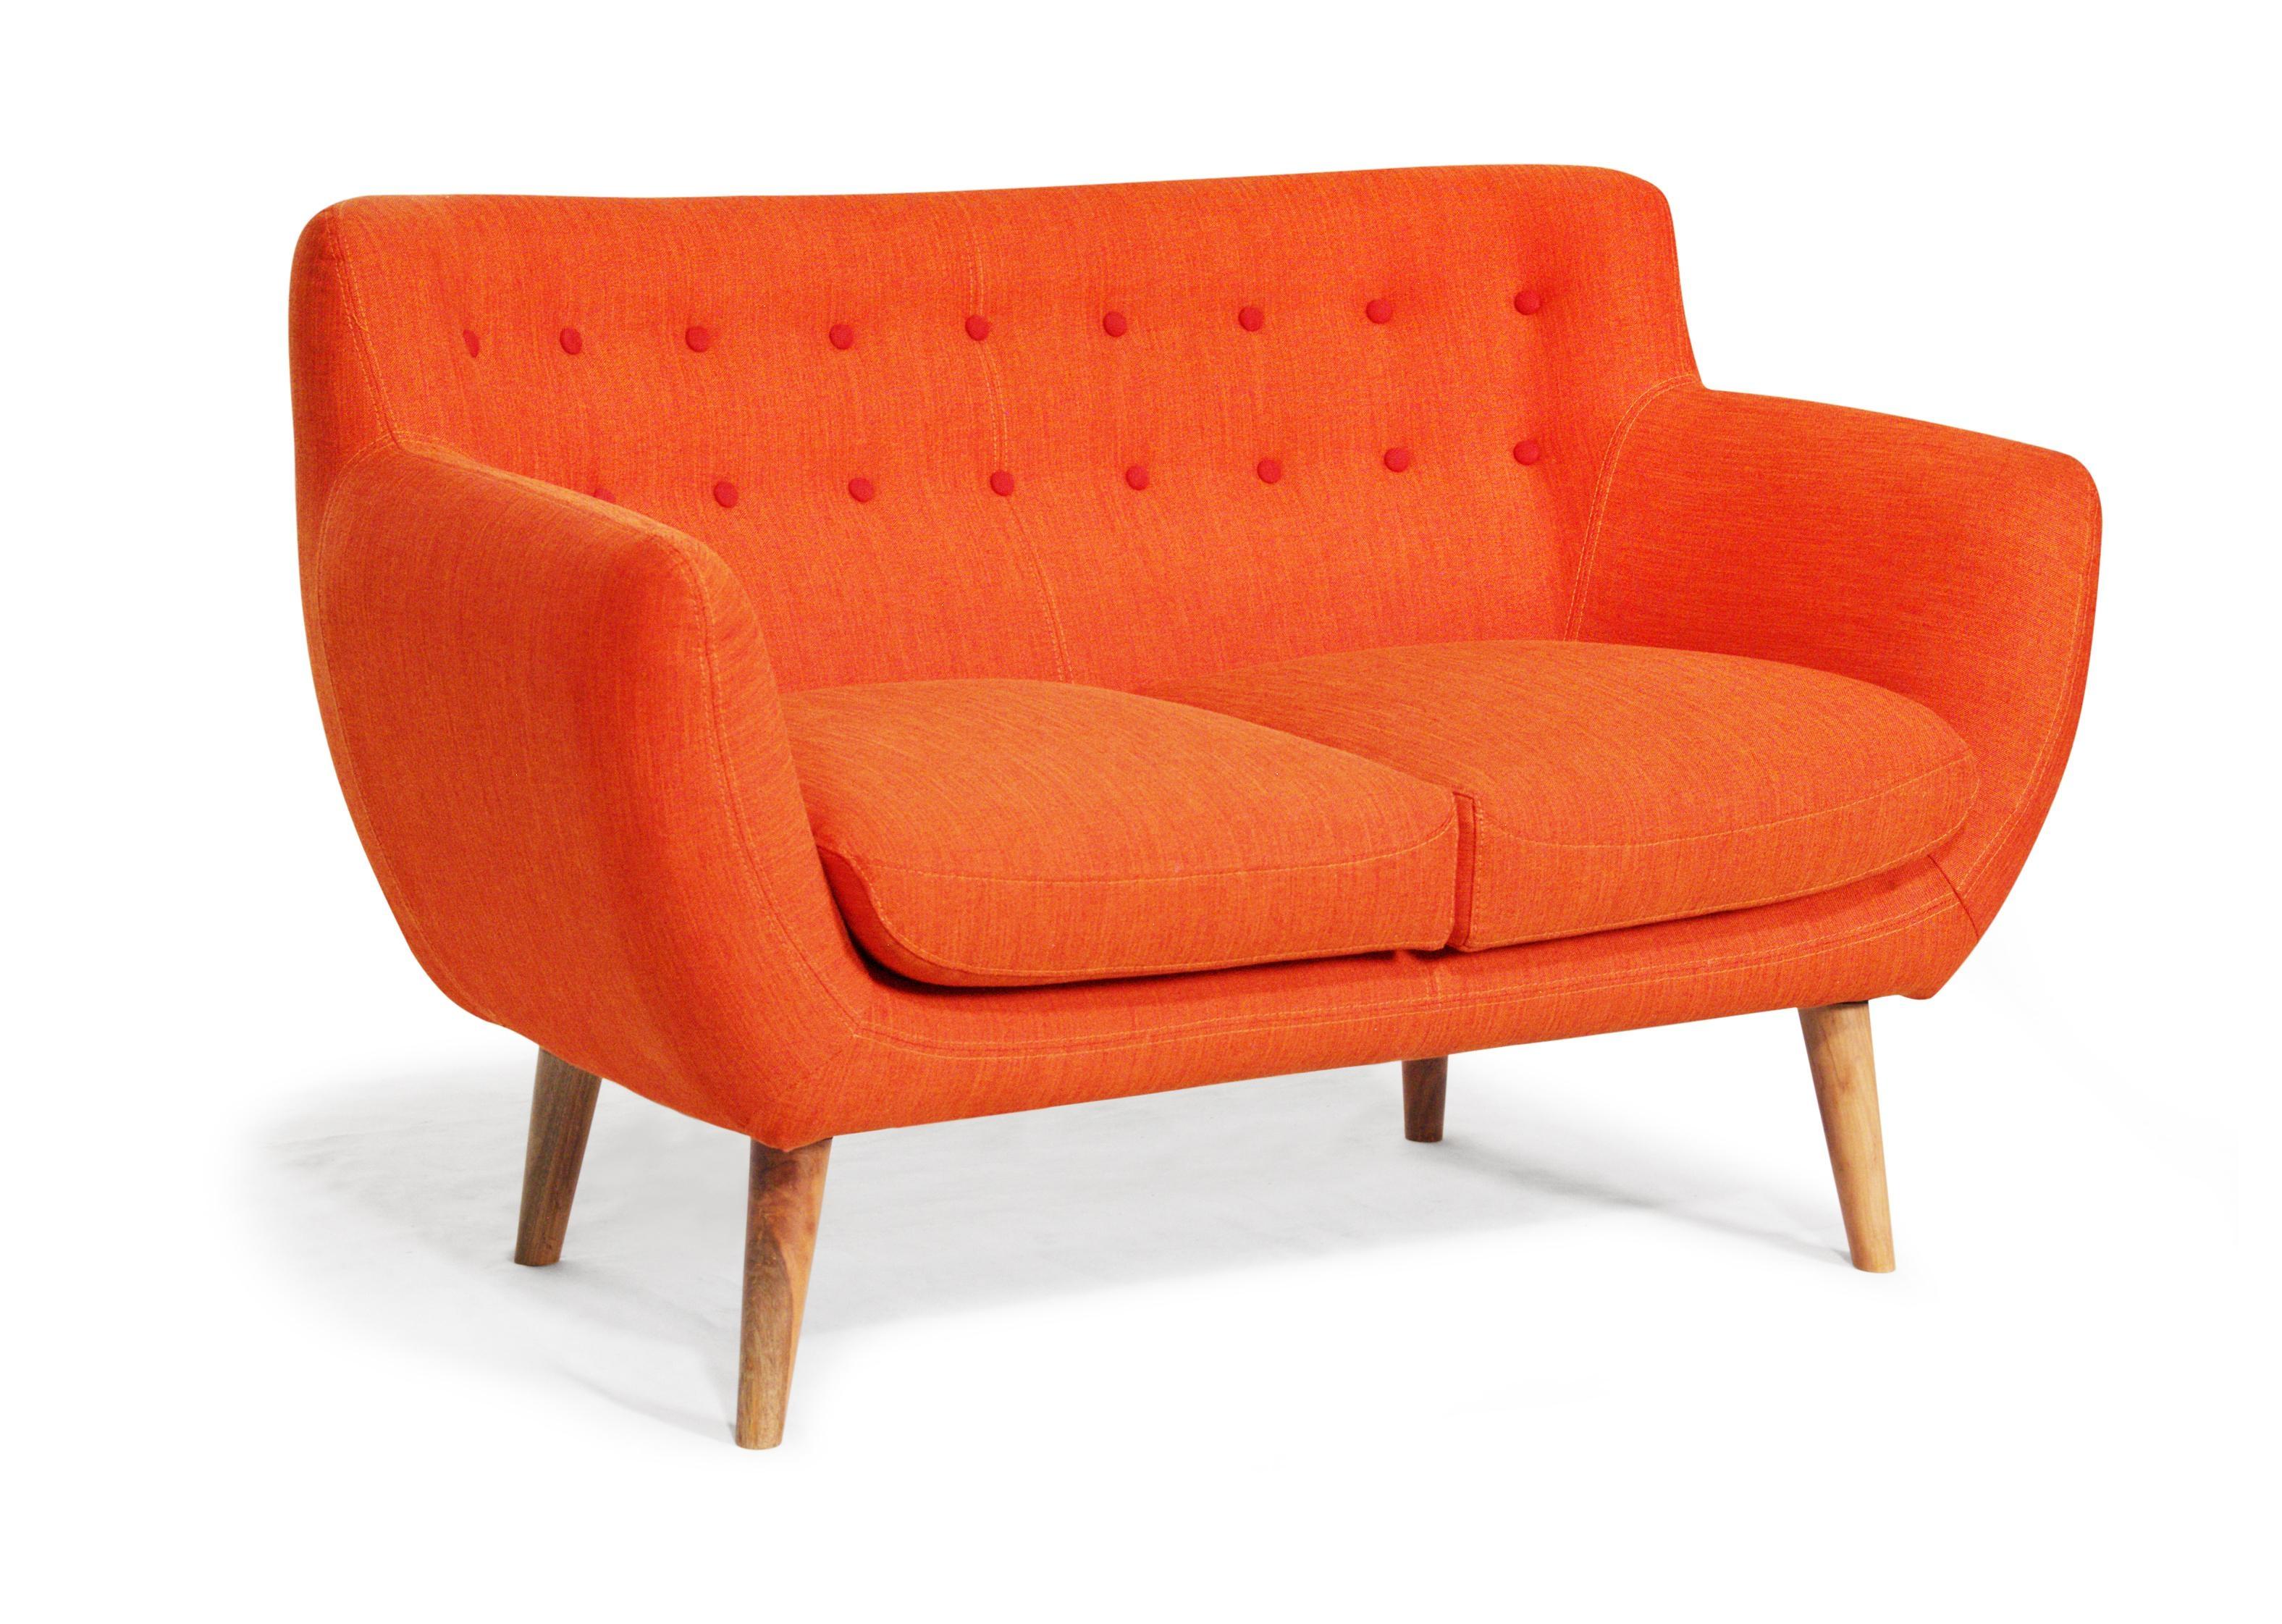 Furniture Designing Home View Rukle Dashing Orange Sofa For ~ Idolza Within Orange Sofa Chairs (View 11 of 20)